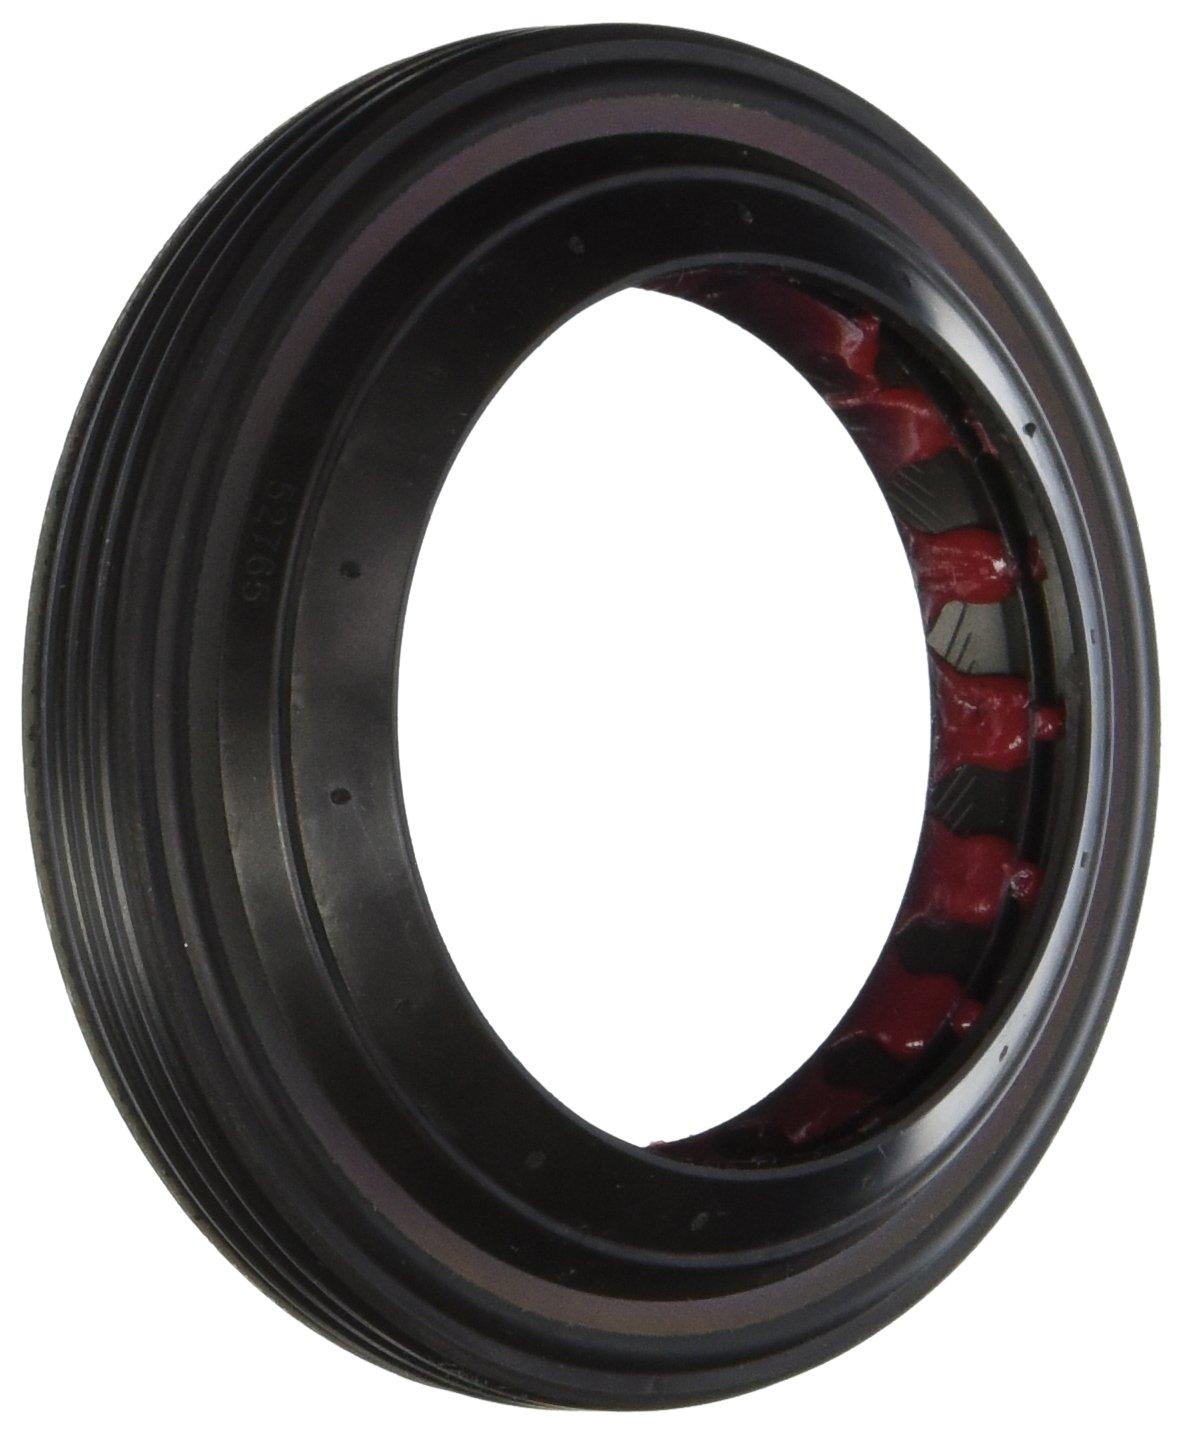 Genuine  Nissan (43252-7S200) Axle Shaft Oil Seal, Rear